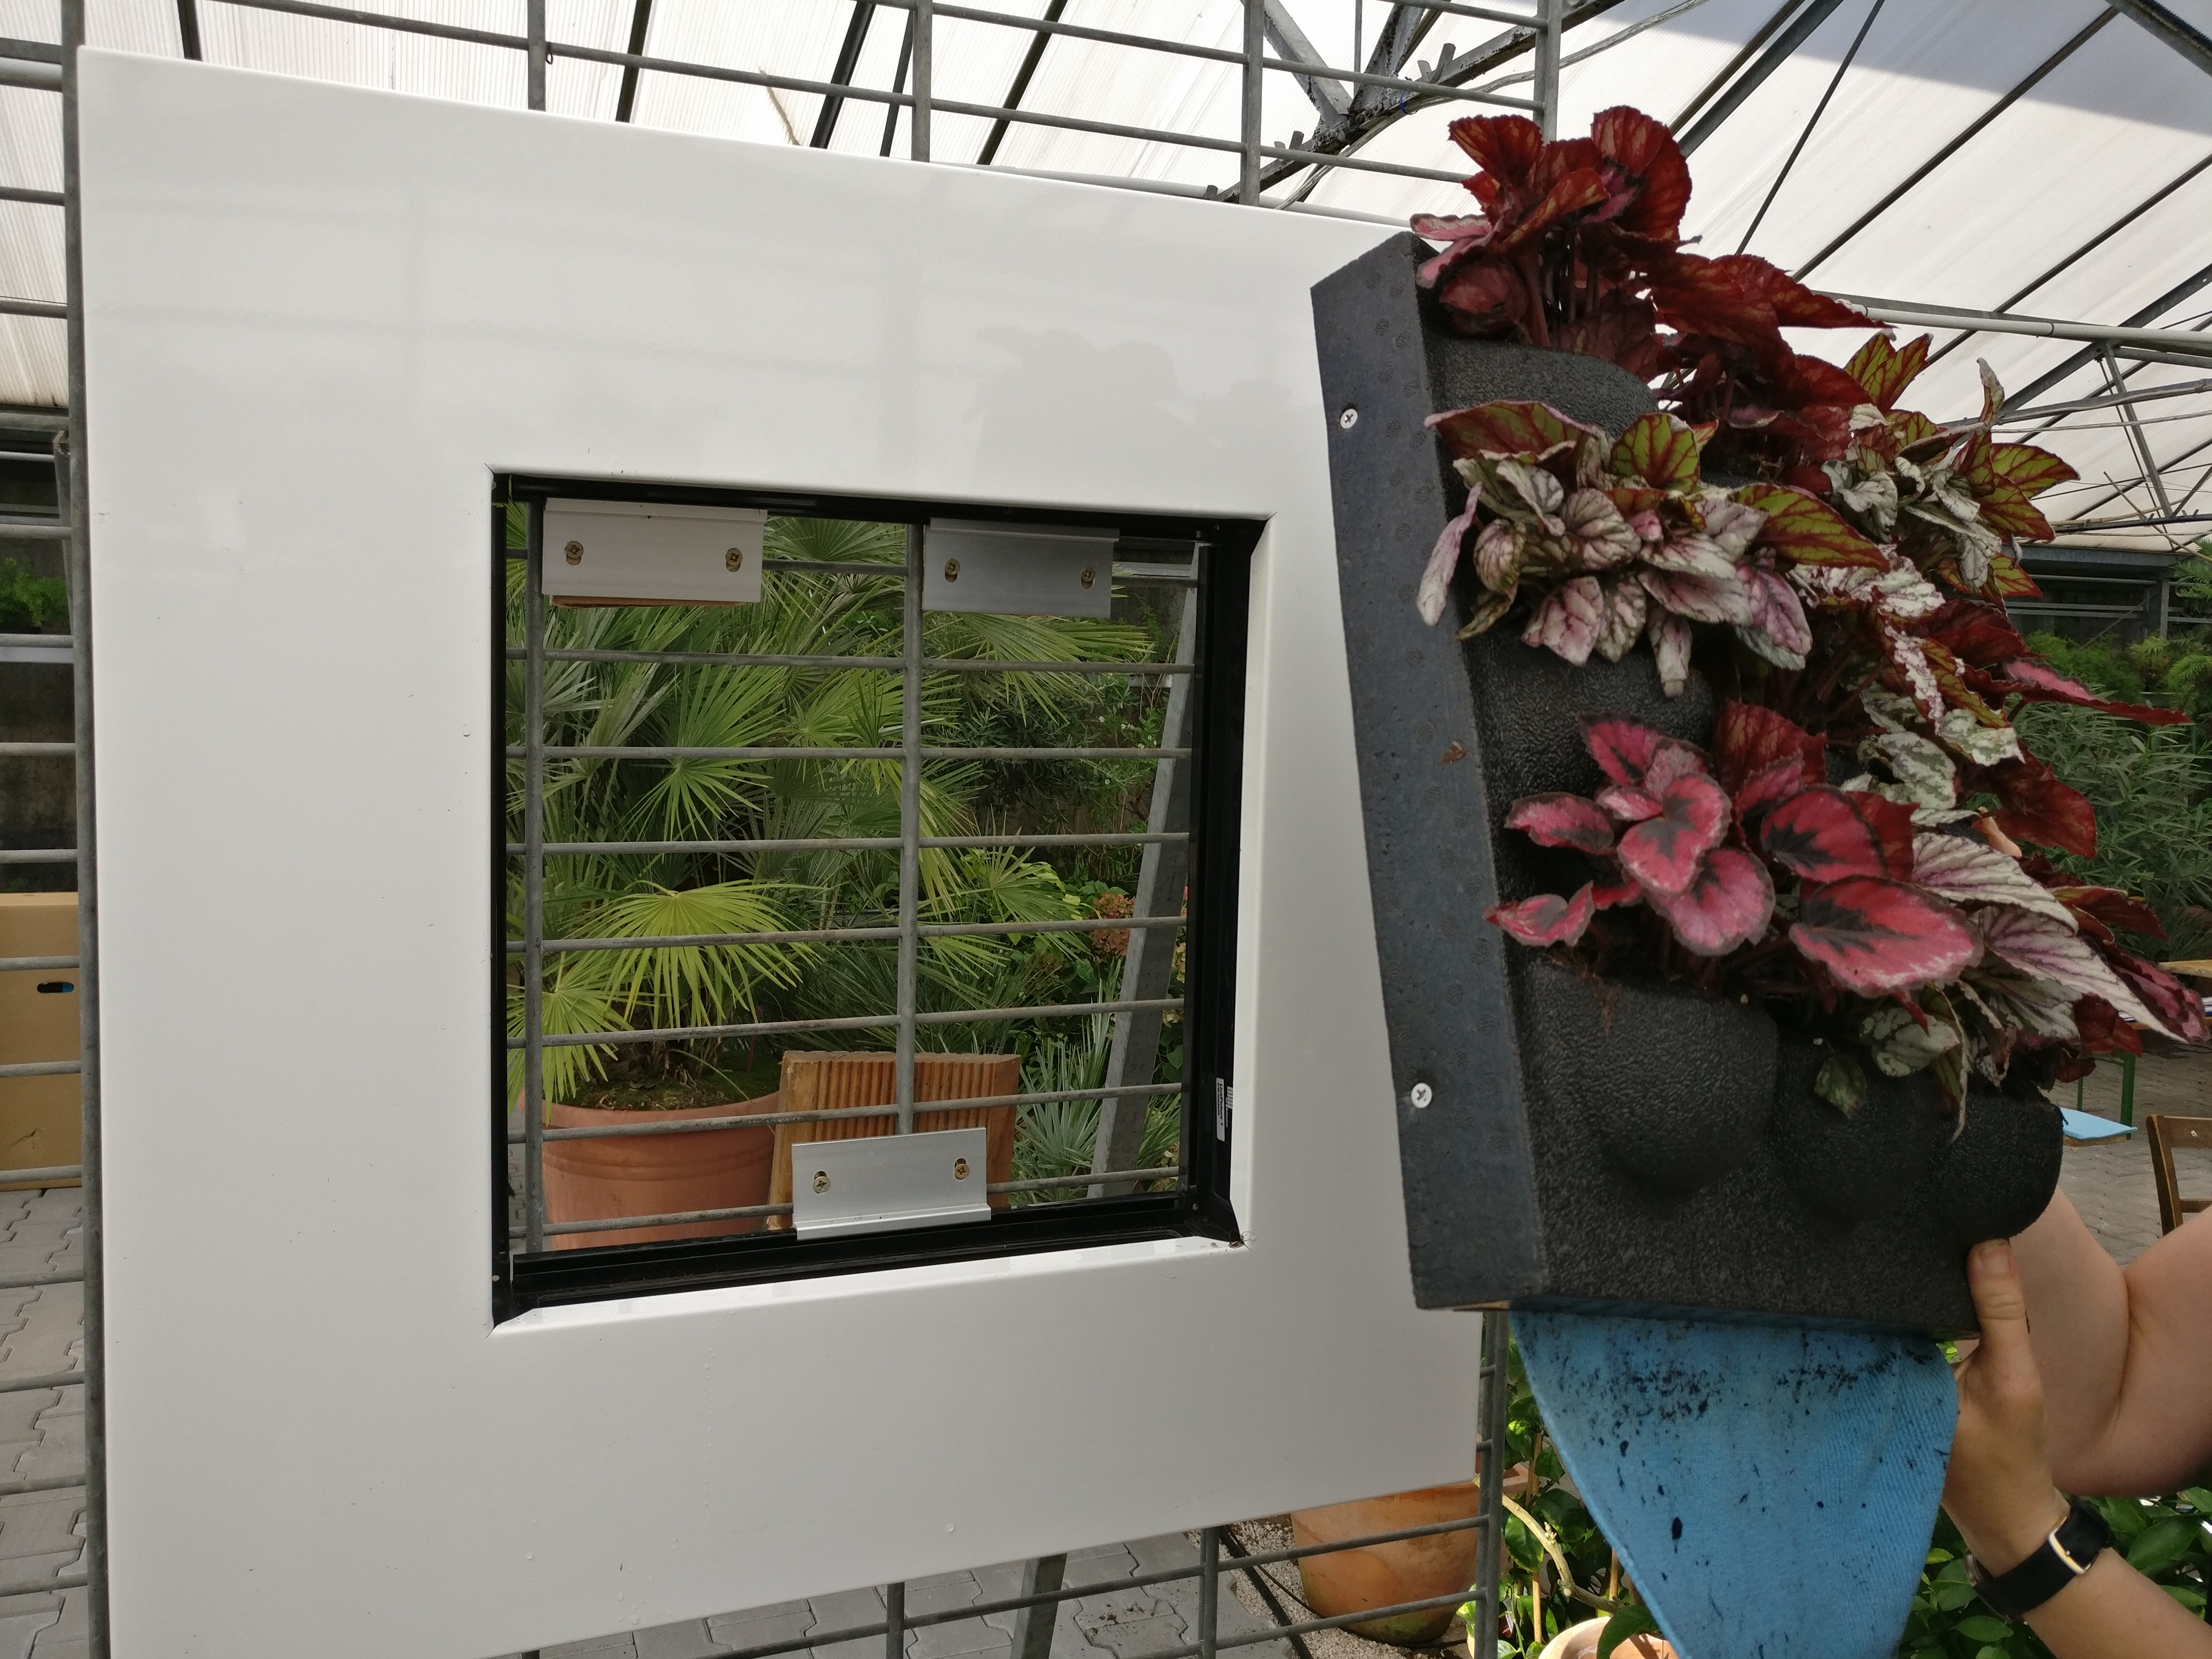 lebende bilder pflanzen als lifestyle schwabach meier. Black Bedroom Furniture Sets. Home Design Ideas